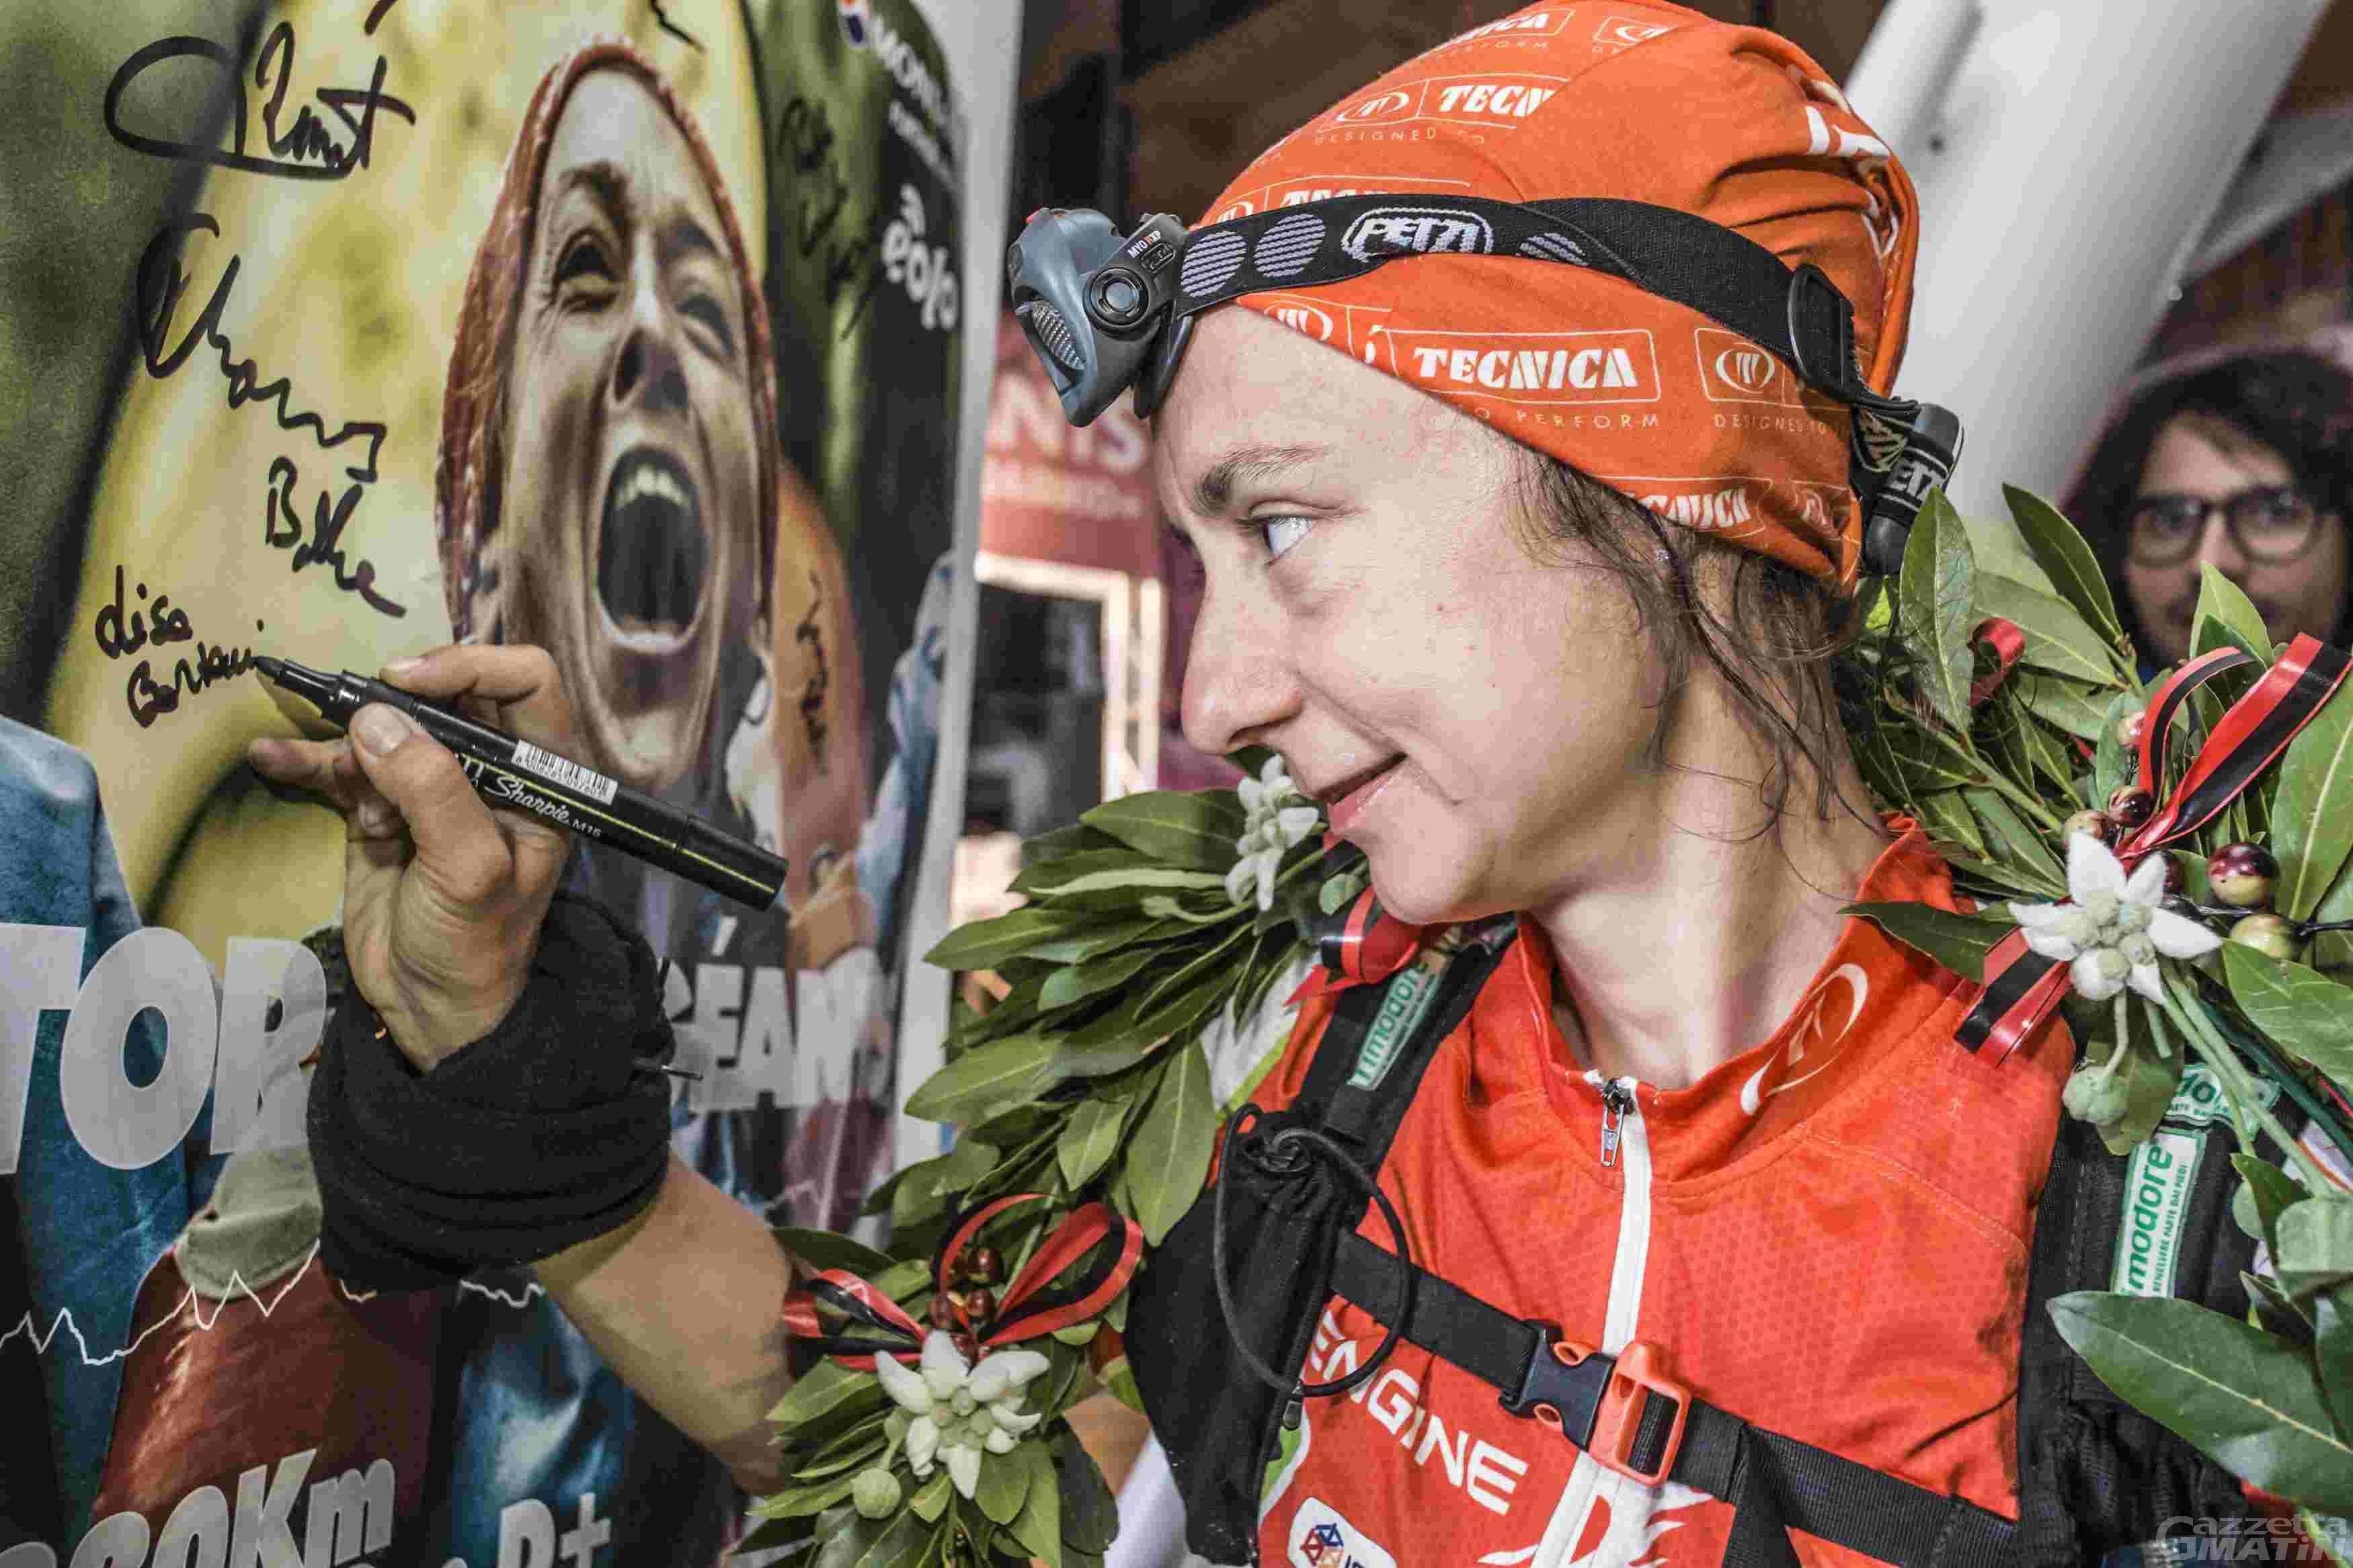 Tor des Géants: Lisa Borzani vince al femminile